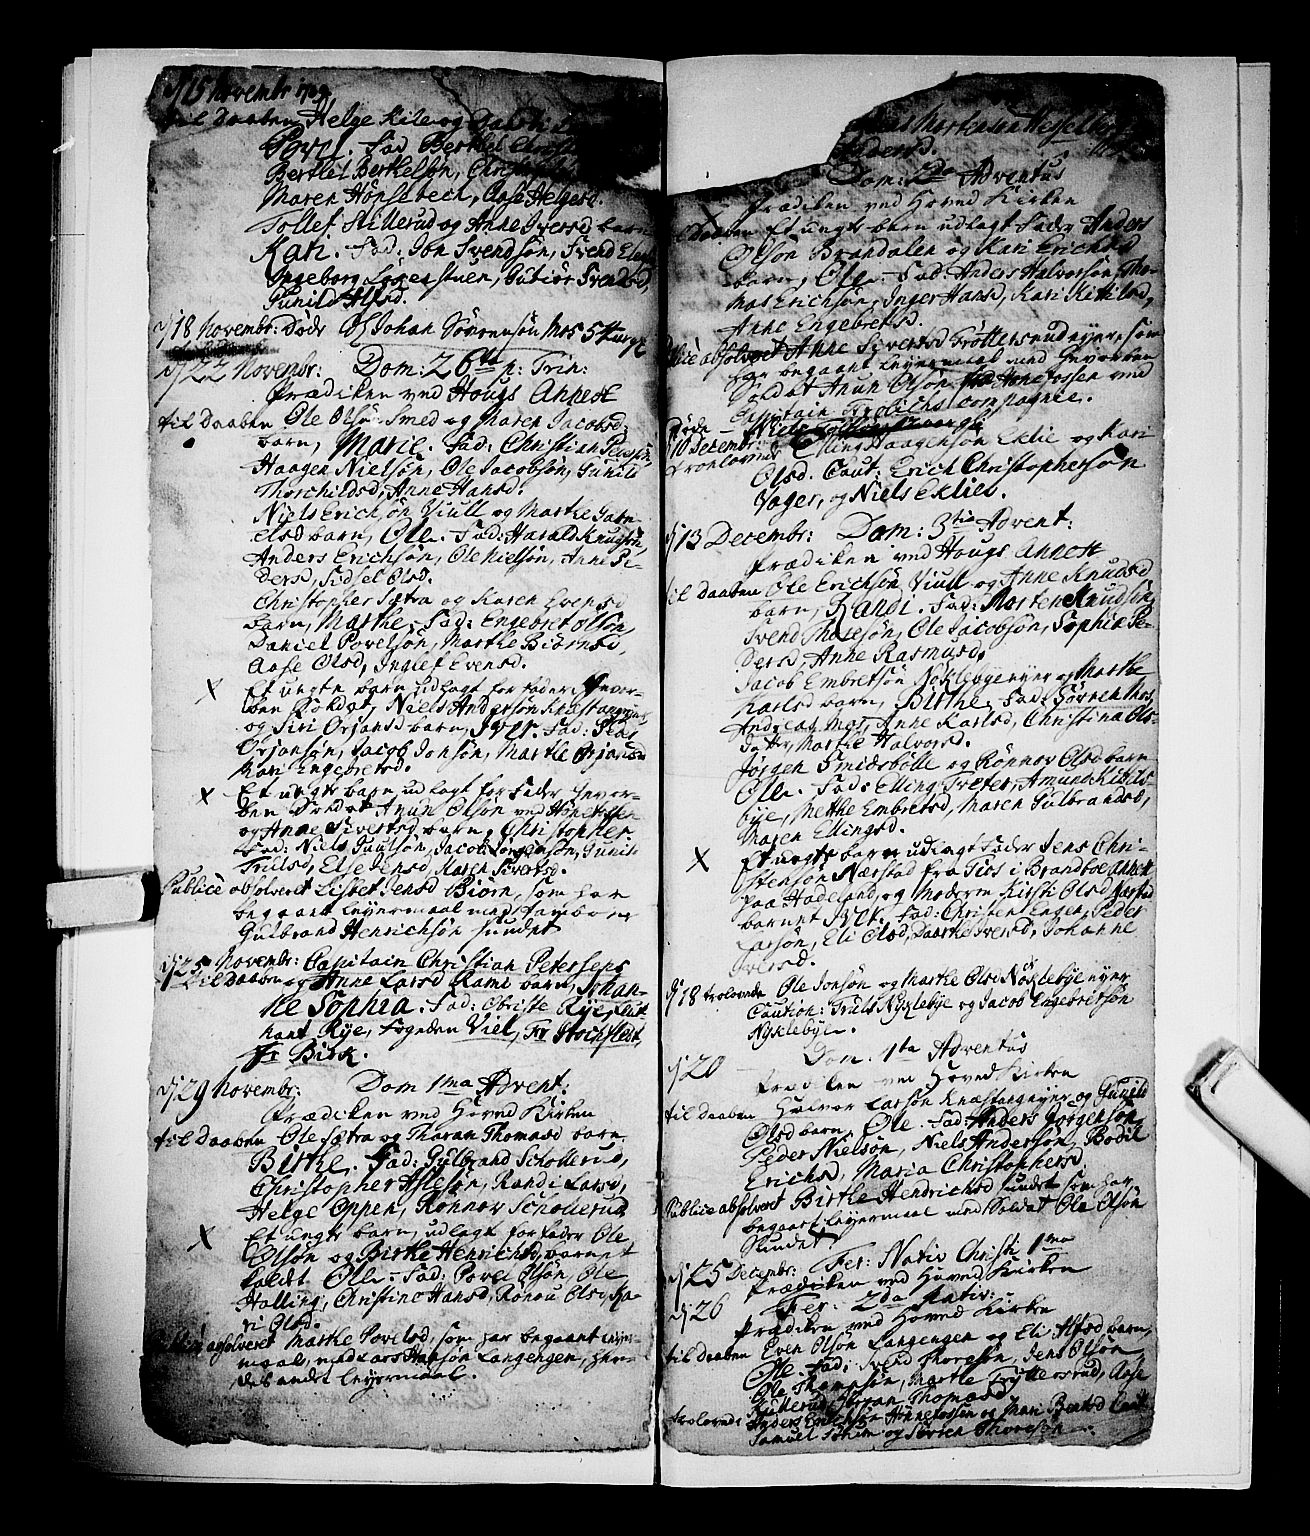 SAKO, Norderhov kirkebøker, F/Fa/L0002b: Ministerialbok nr. 2B, 1726-1739, s. 594-595